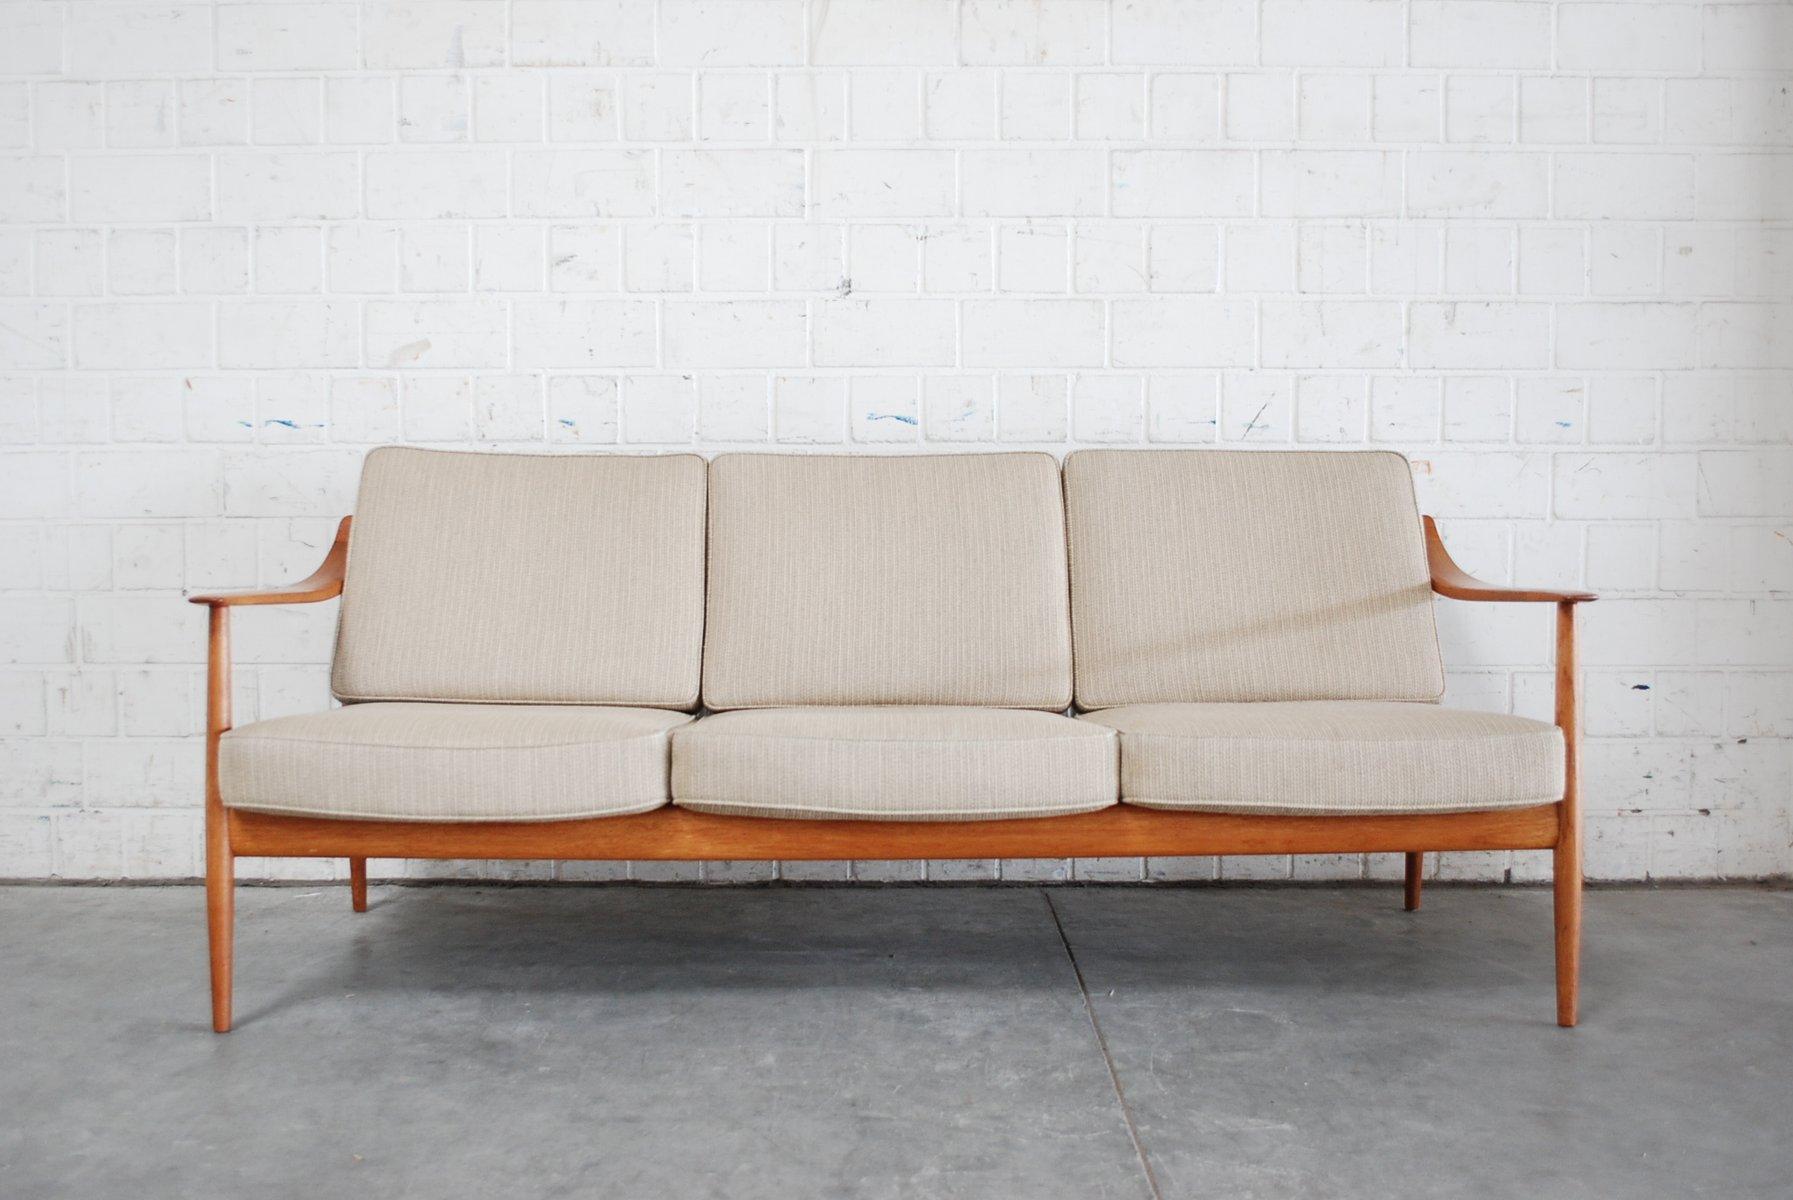 canap en teck par knoll antimott danemark en vente sur. Black Bedroom Furniture Sets. Home Design Ideas